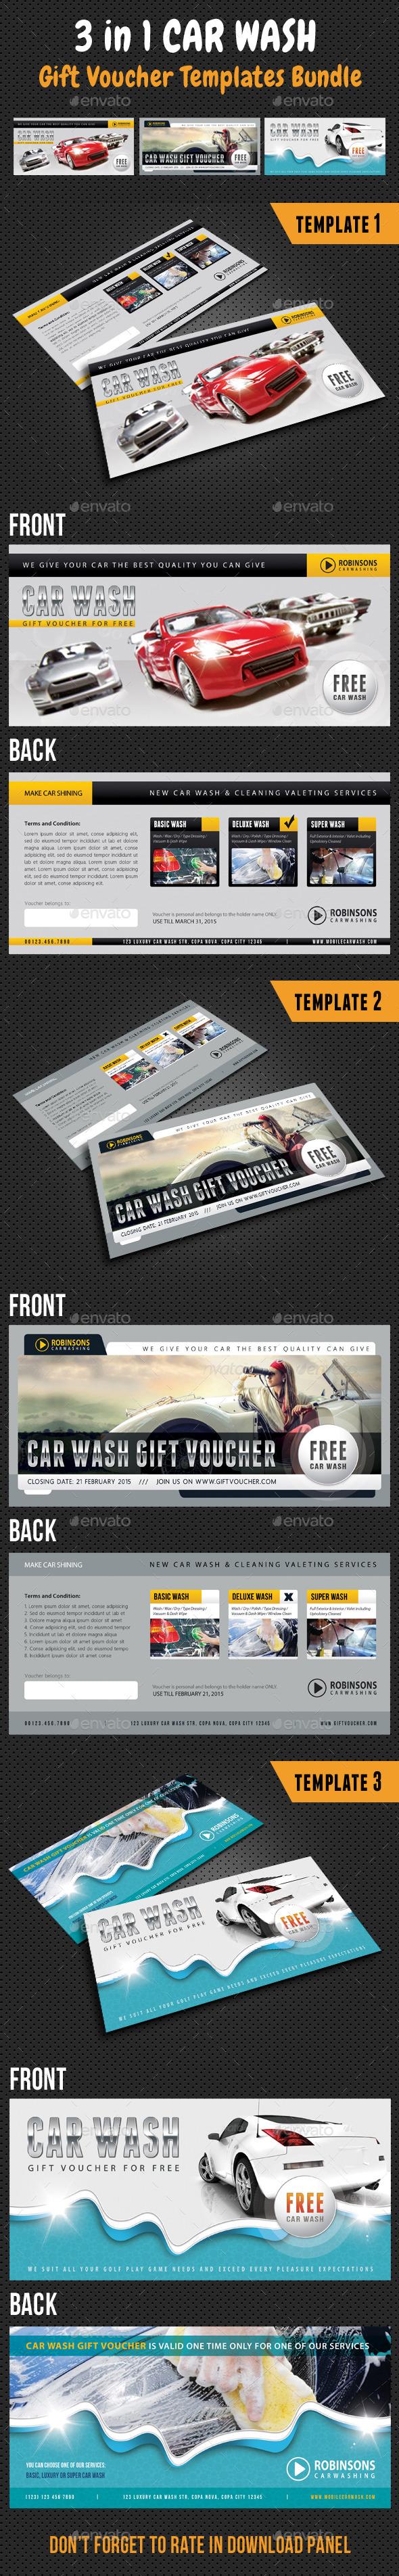 3 in 1 Car Wash Gift Voucher Bundle - Cards & Invites Print Templates